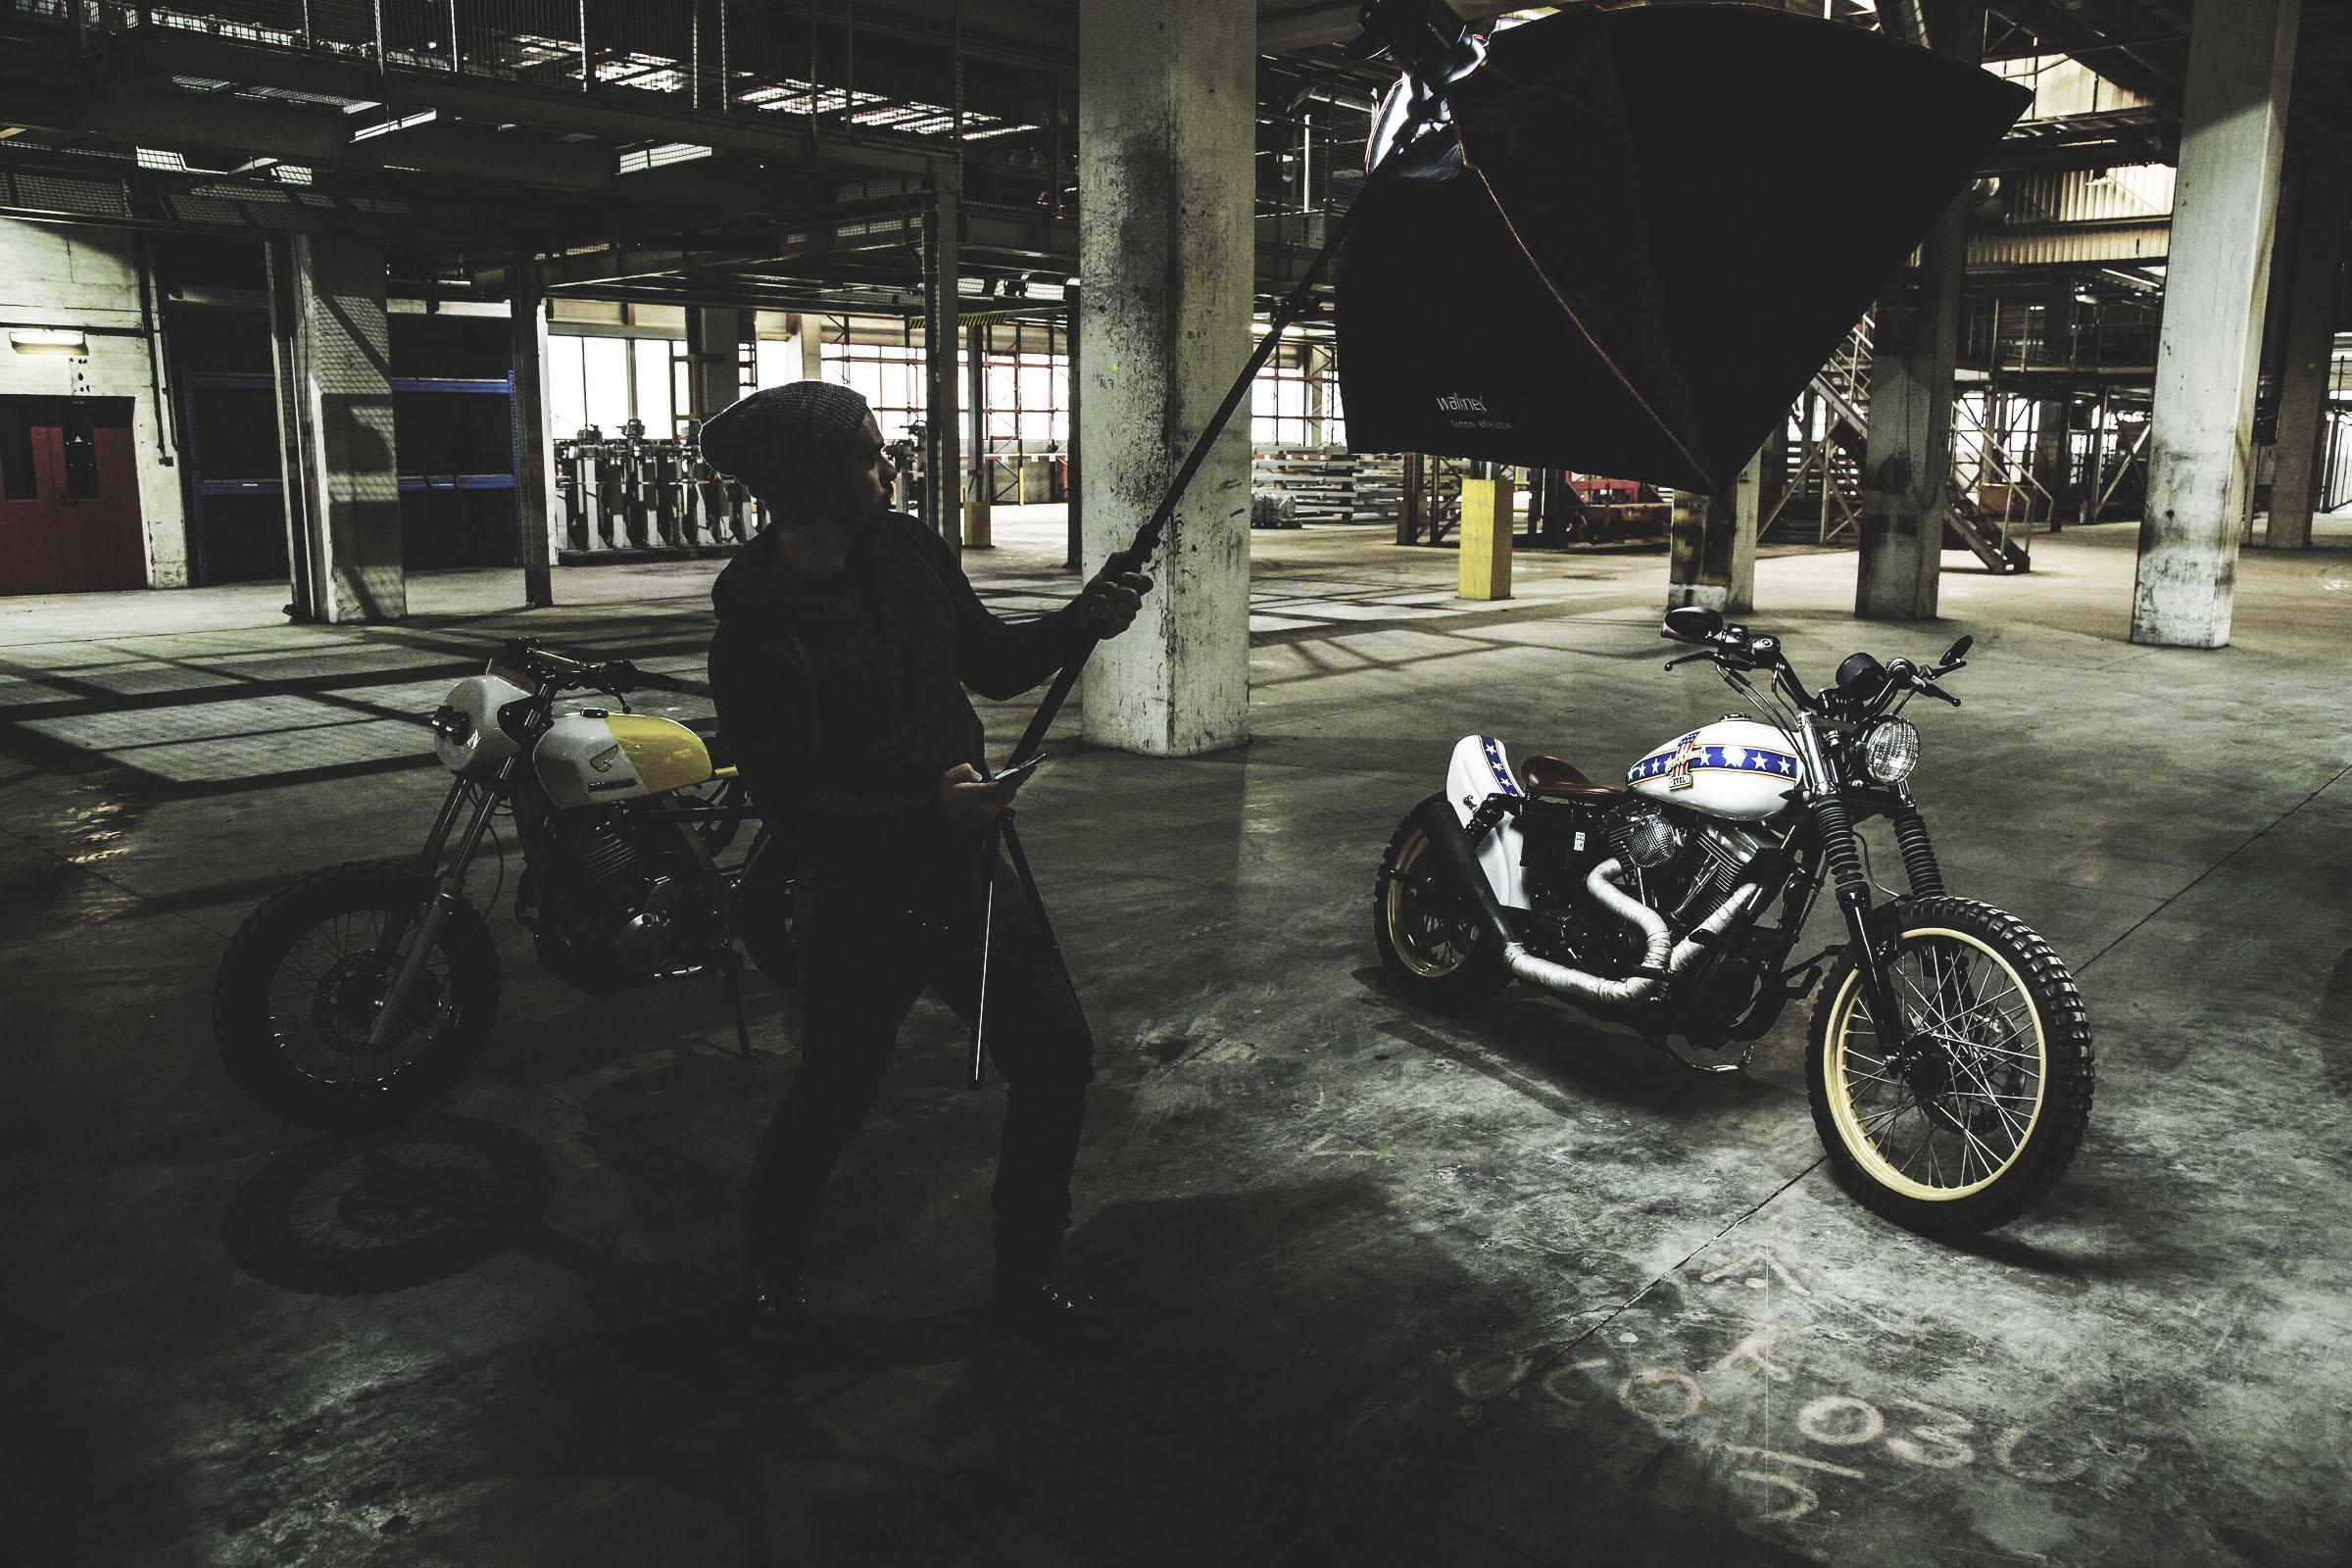 TITAN-Harley-Davidson-Dyna-Wide-Glide-Evel-Knievel_Harley-Umbau_Cafe-Racer-Graz-Motorrad-Umbau-Austria-Vintage_Custom-Bikes (2)